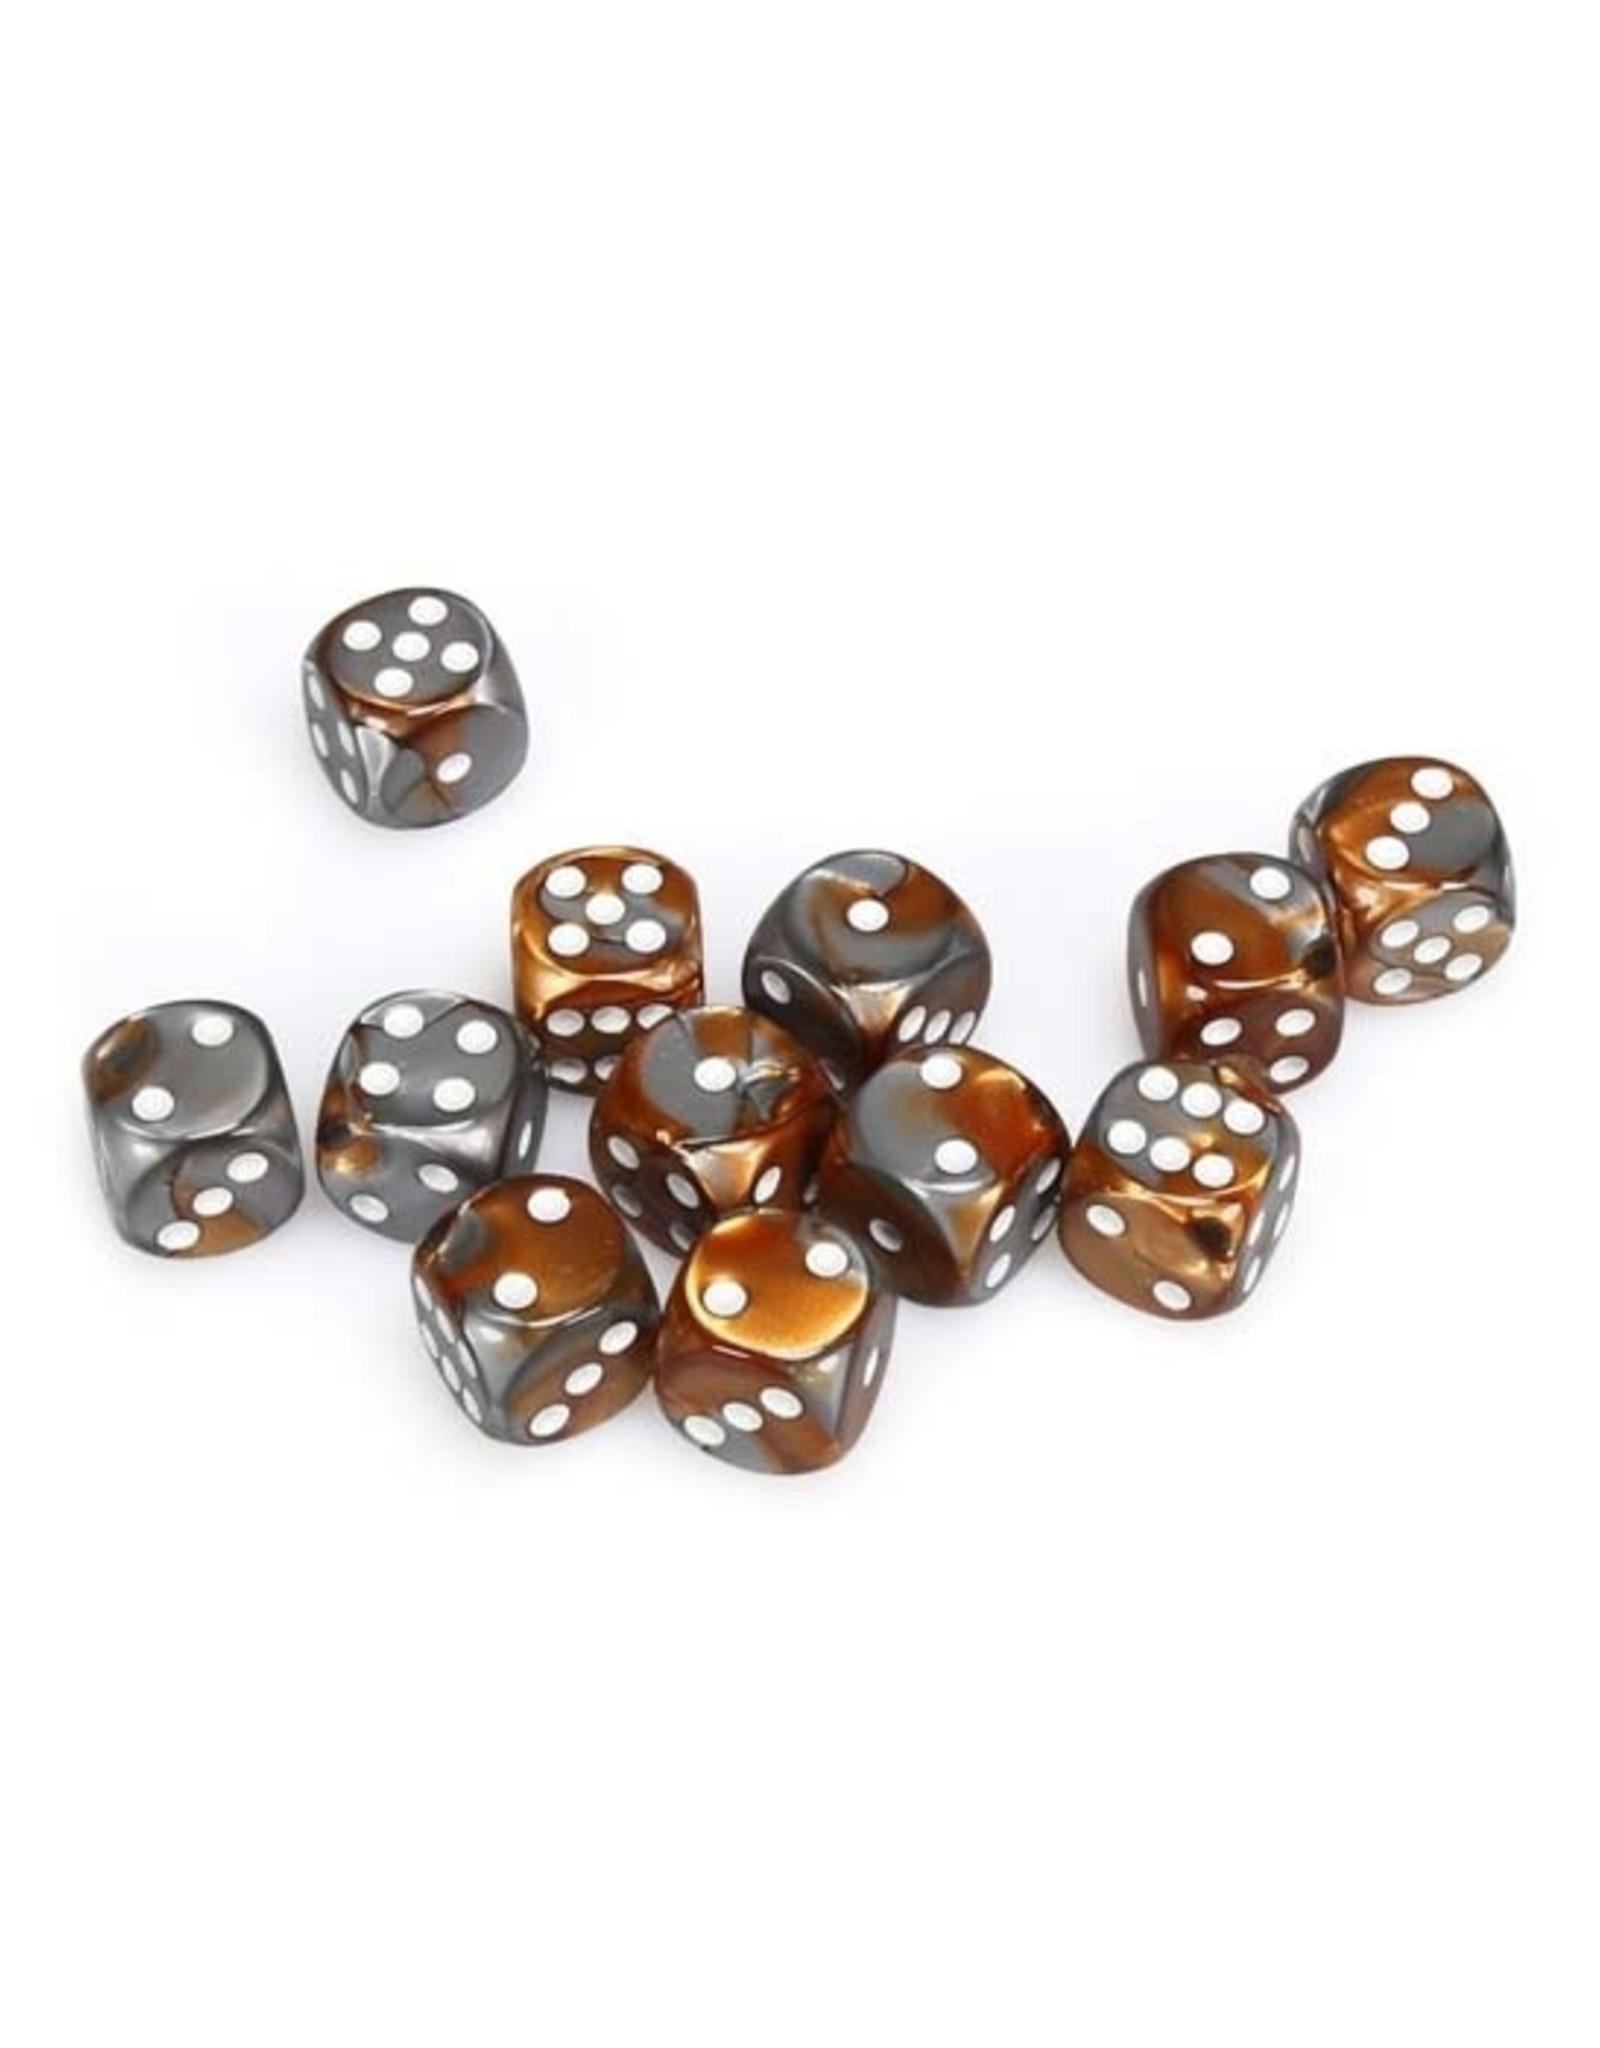 Chessex Chessex: 16mm D6 - Gemini - Copper-Steel w/ White